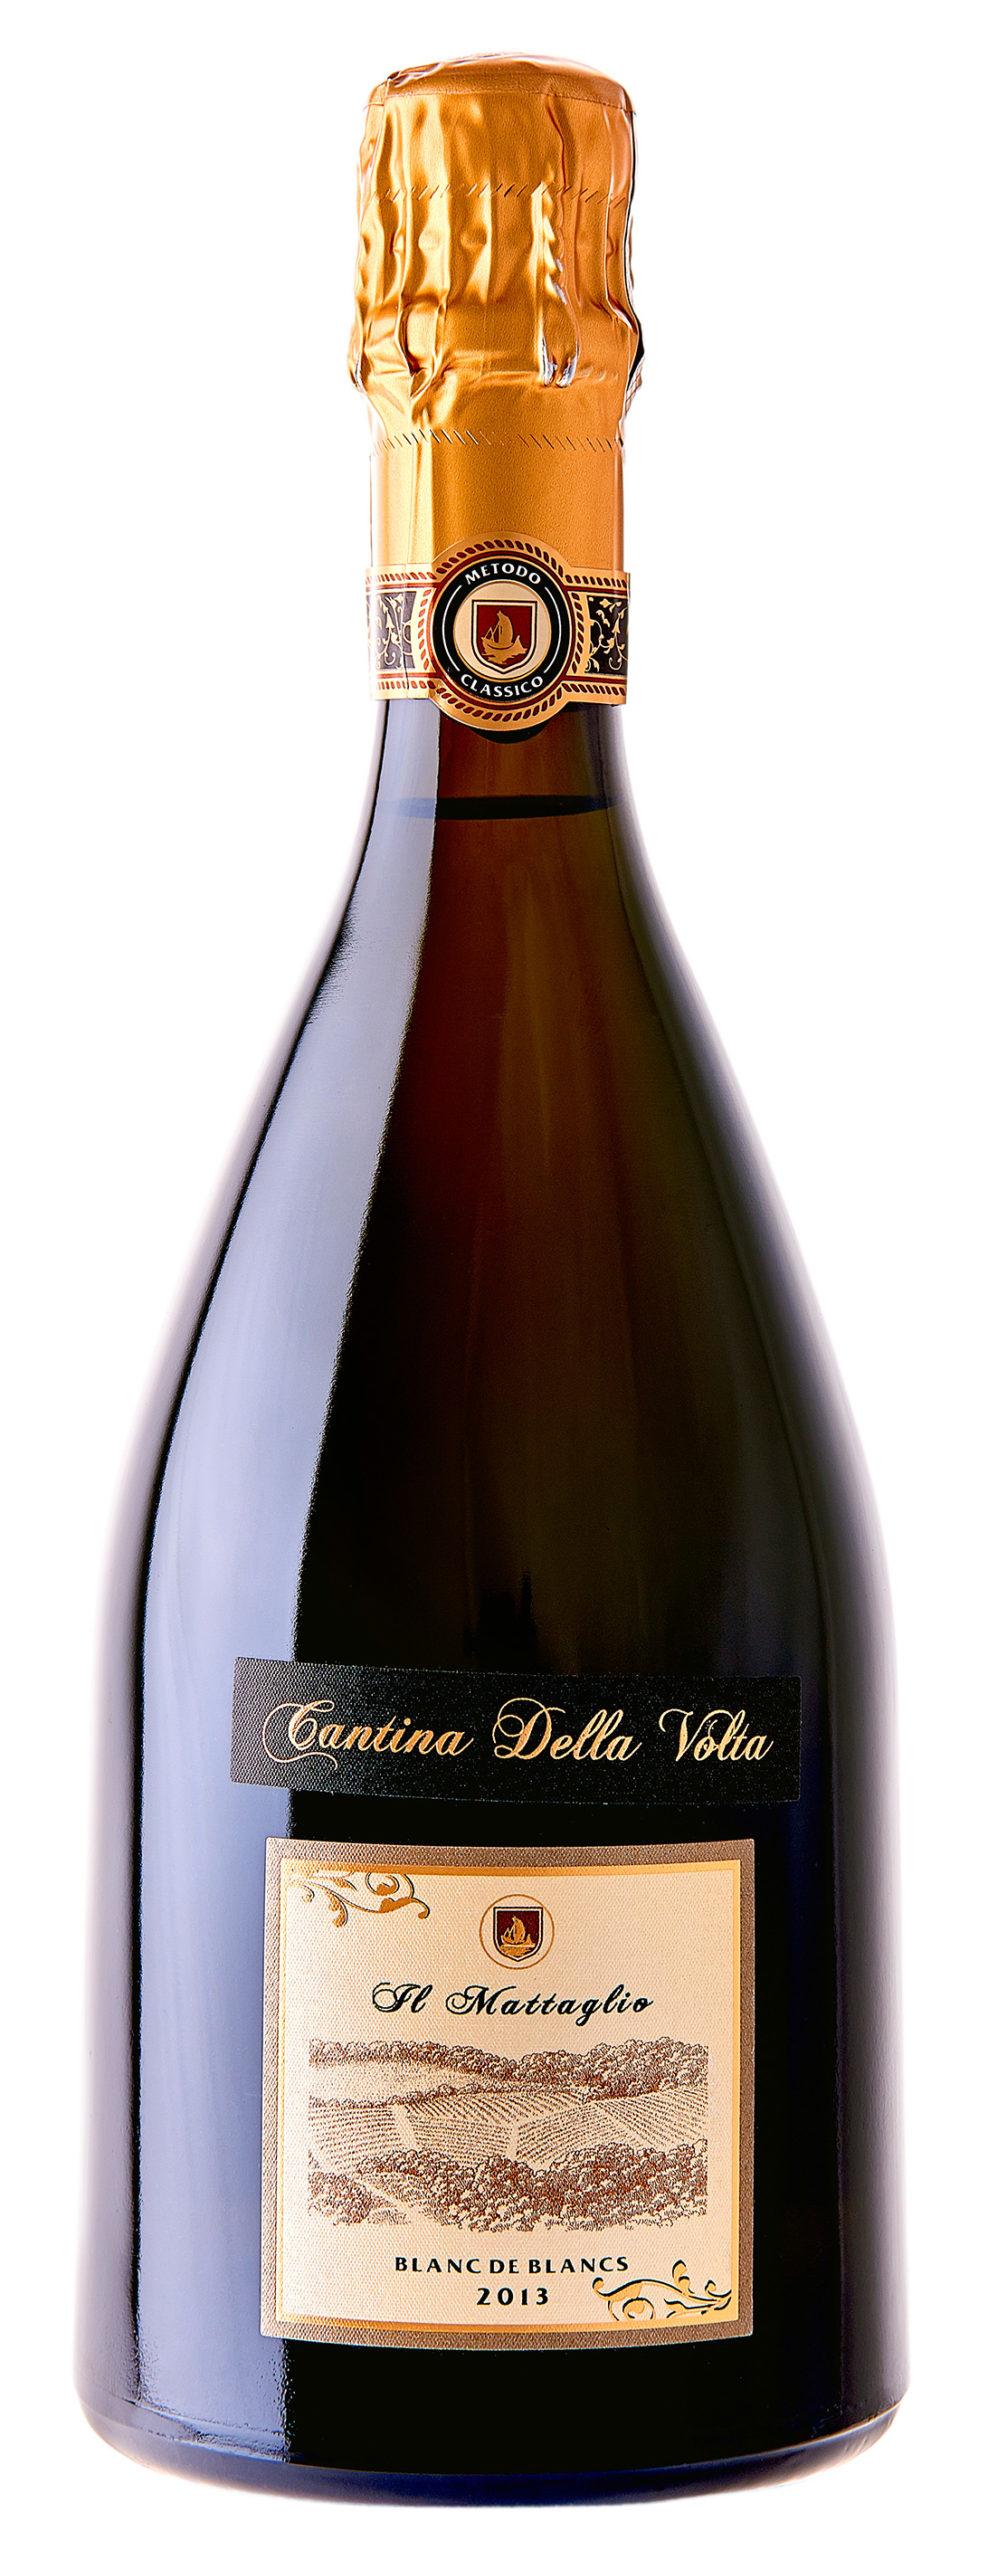 Vino rosso Spumante Brut Metodo Classico Mattaglio Blanc de Blancs